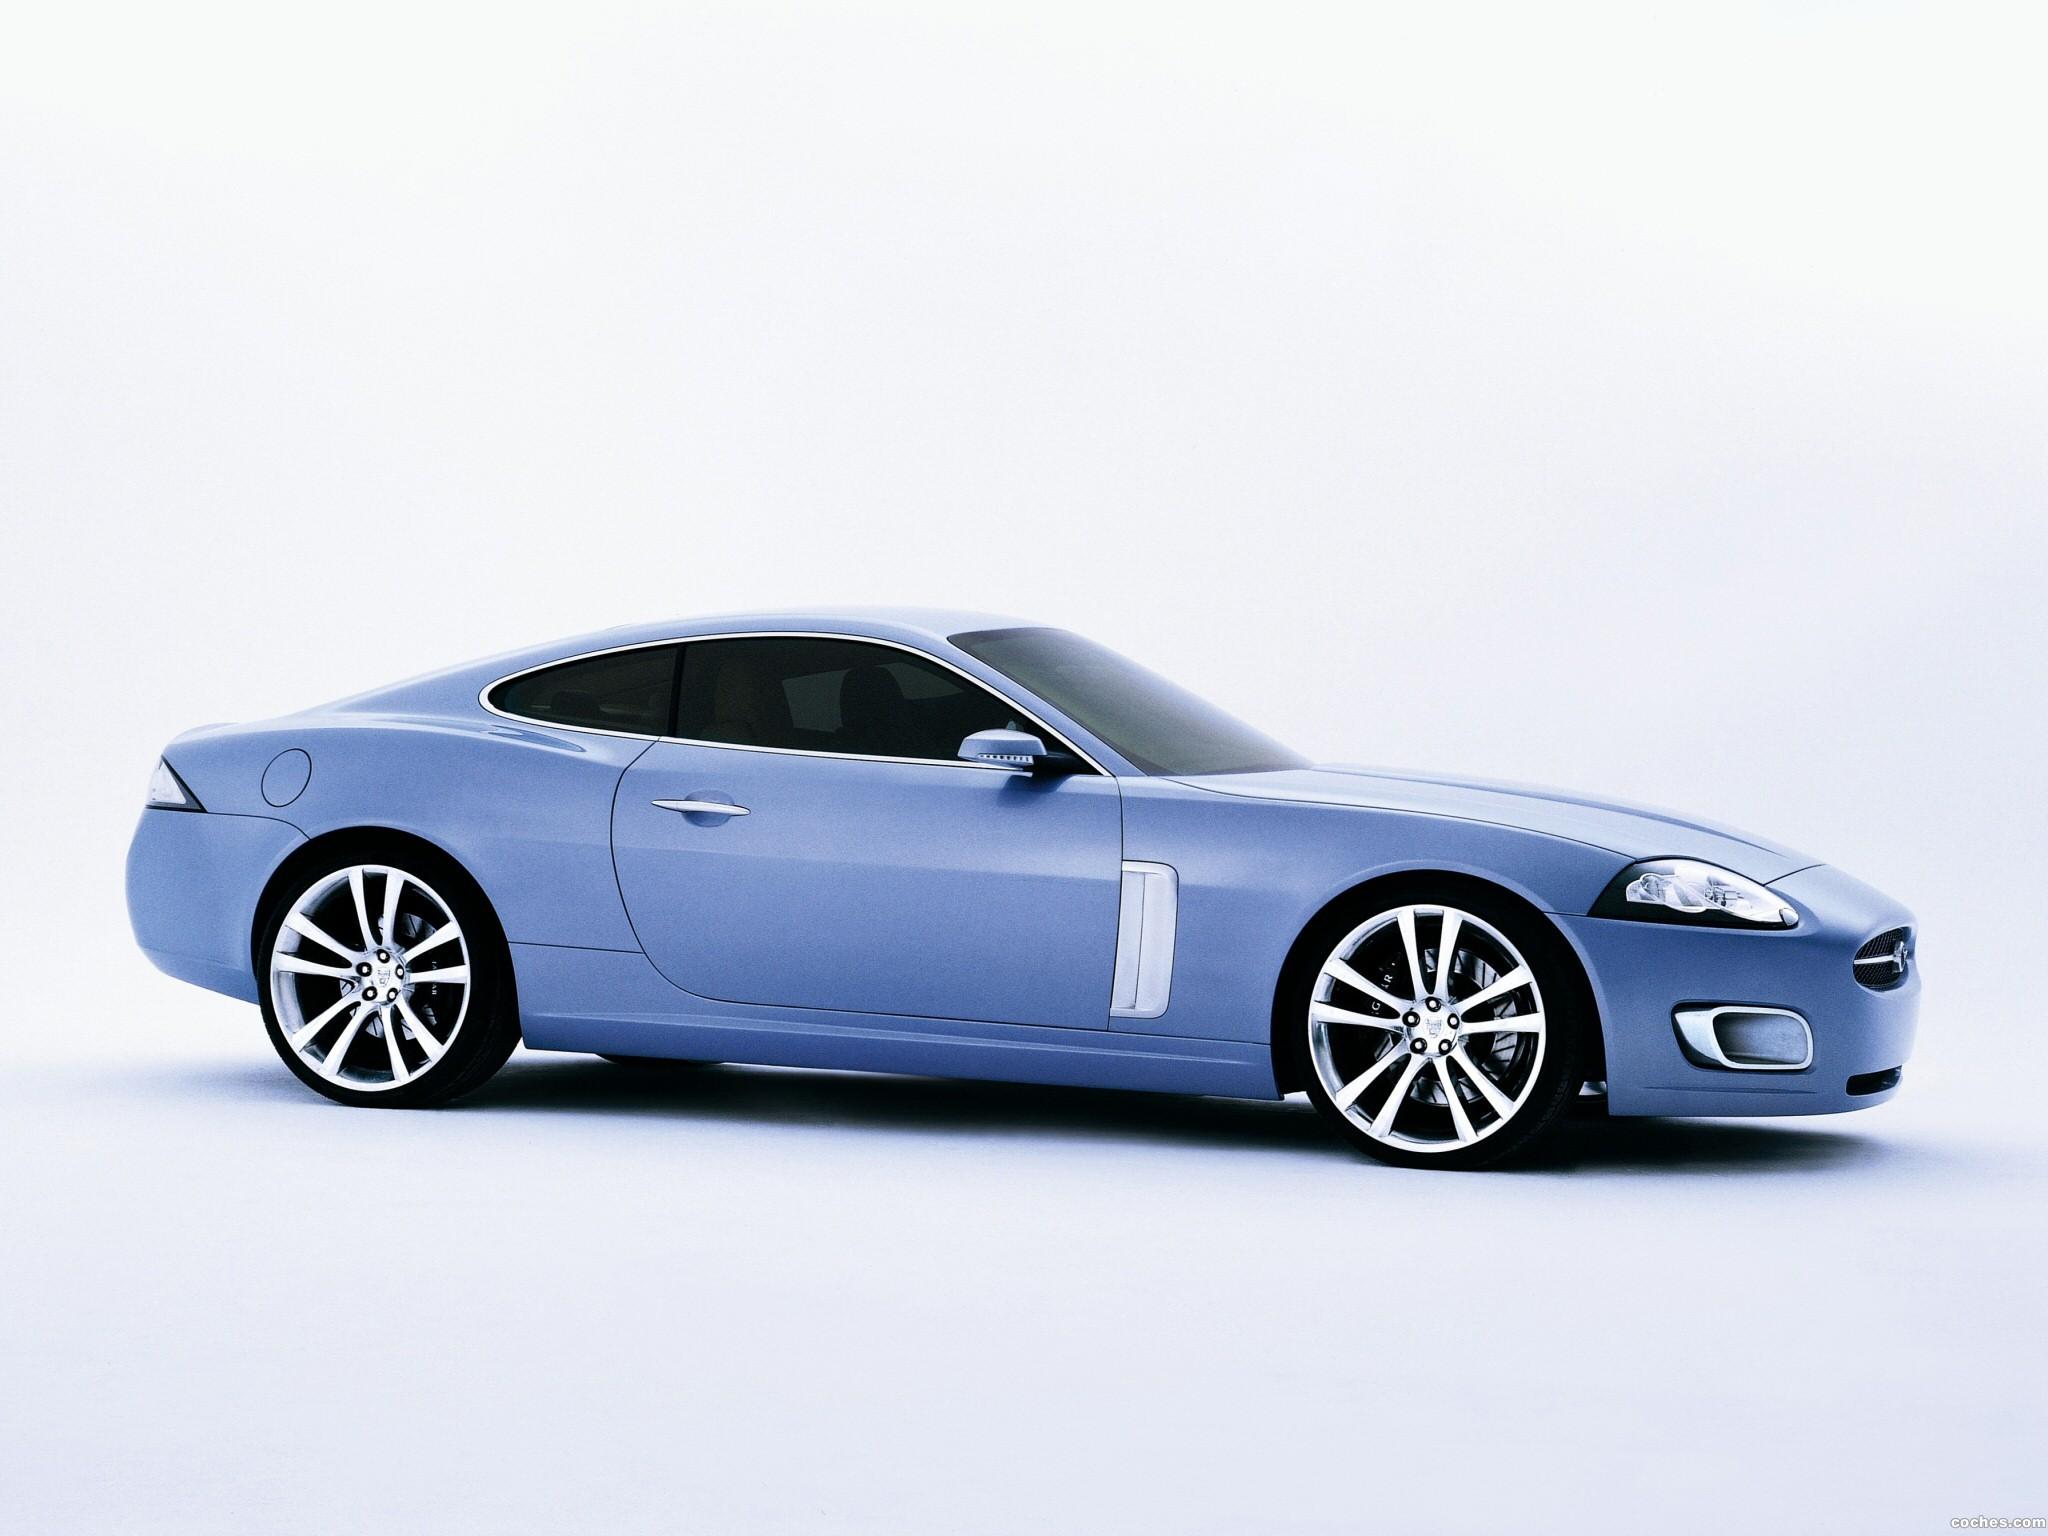 Fotos de Jaguar XK Advanced Lightweight Coupe ALW 2005